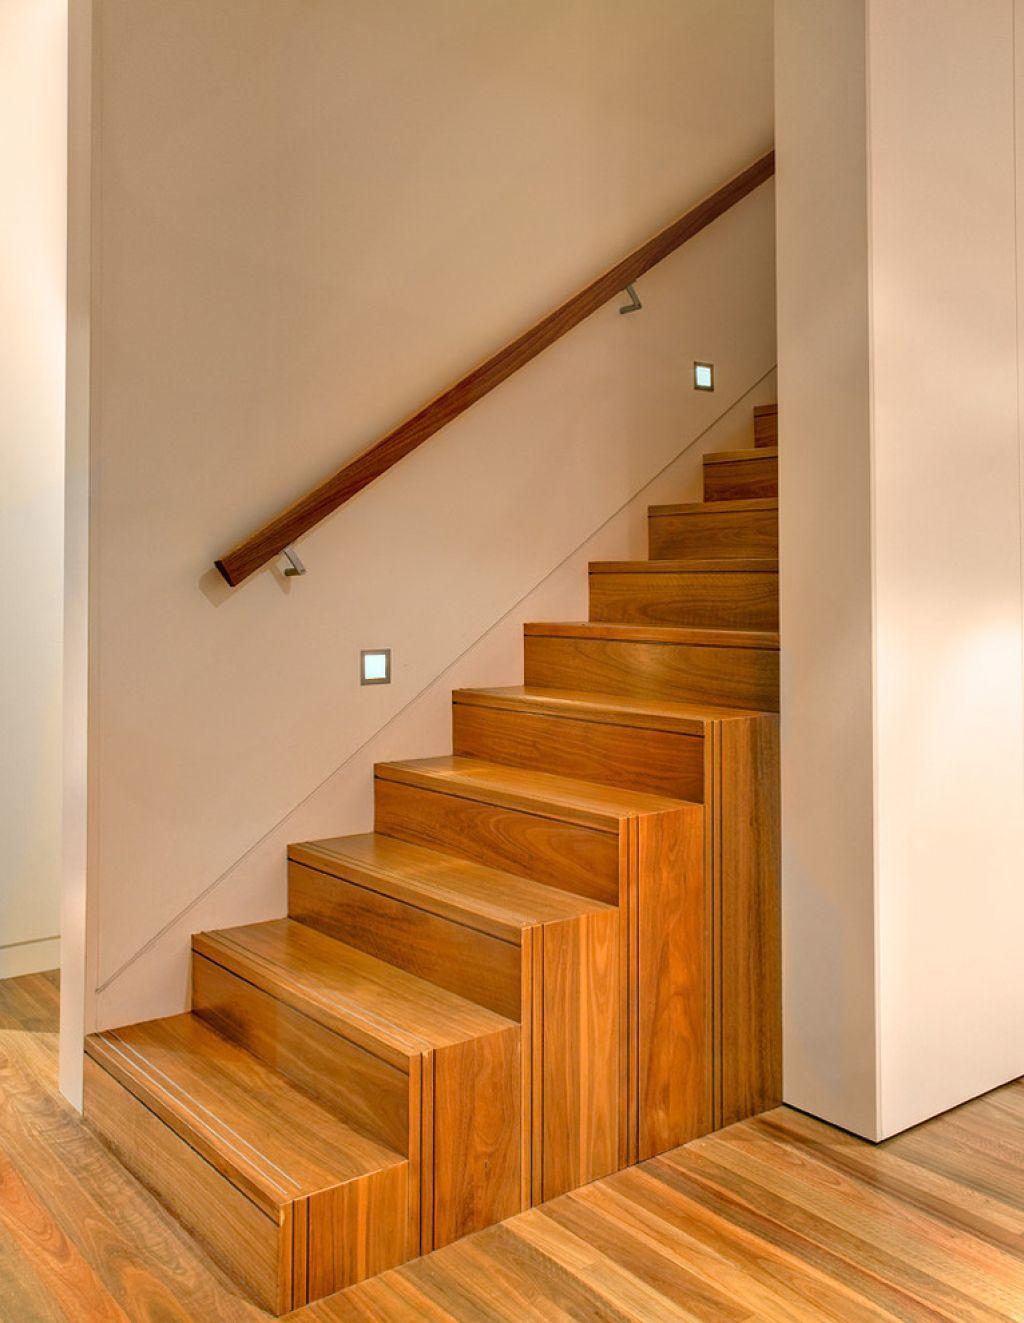 Best Tighten The Stair Handrails In 2019 Attic Staircase 640 x 480